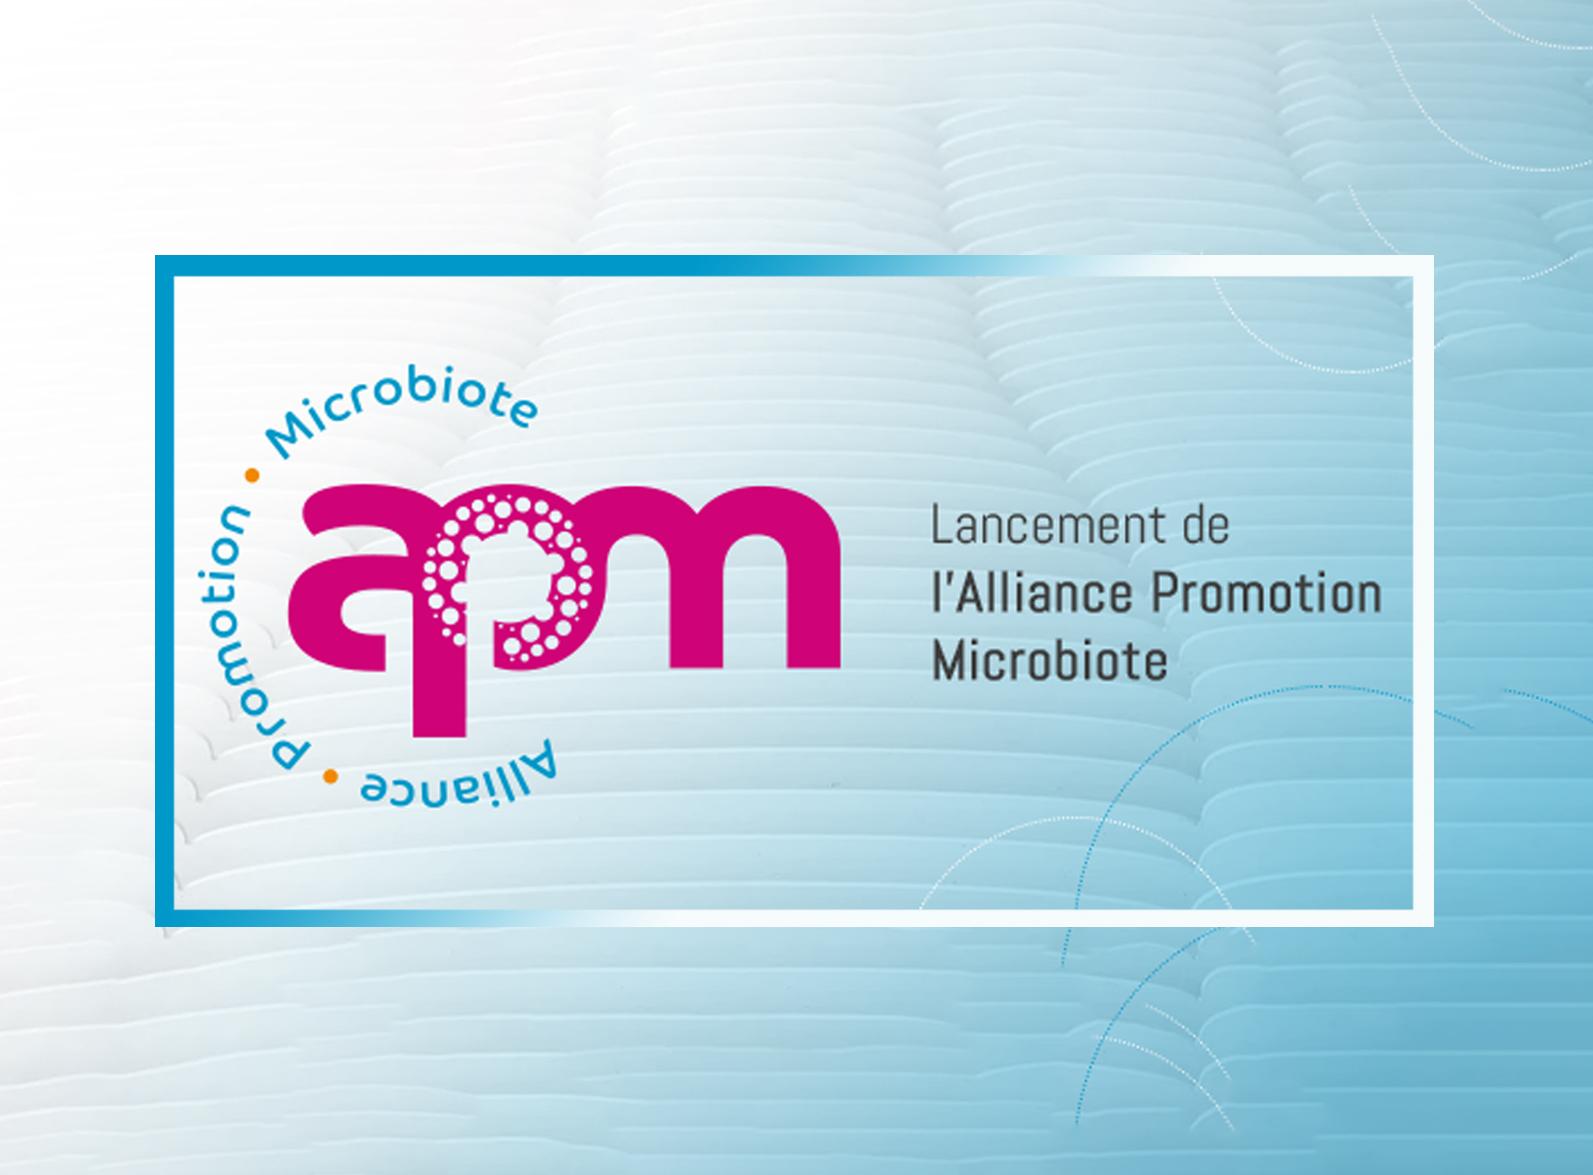 APM, alliance Promotion Microbiote, Bioaster